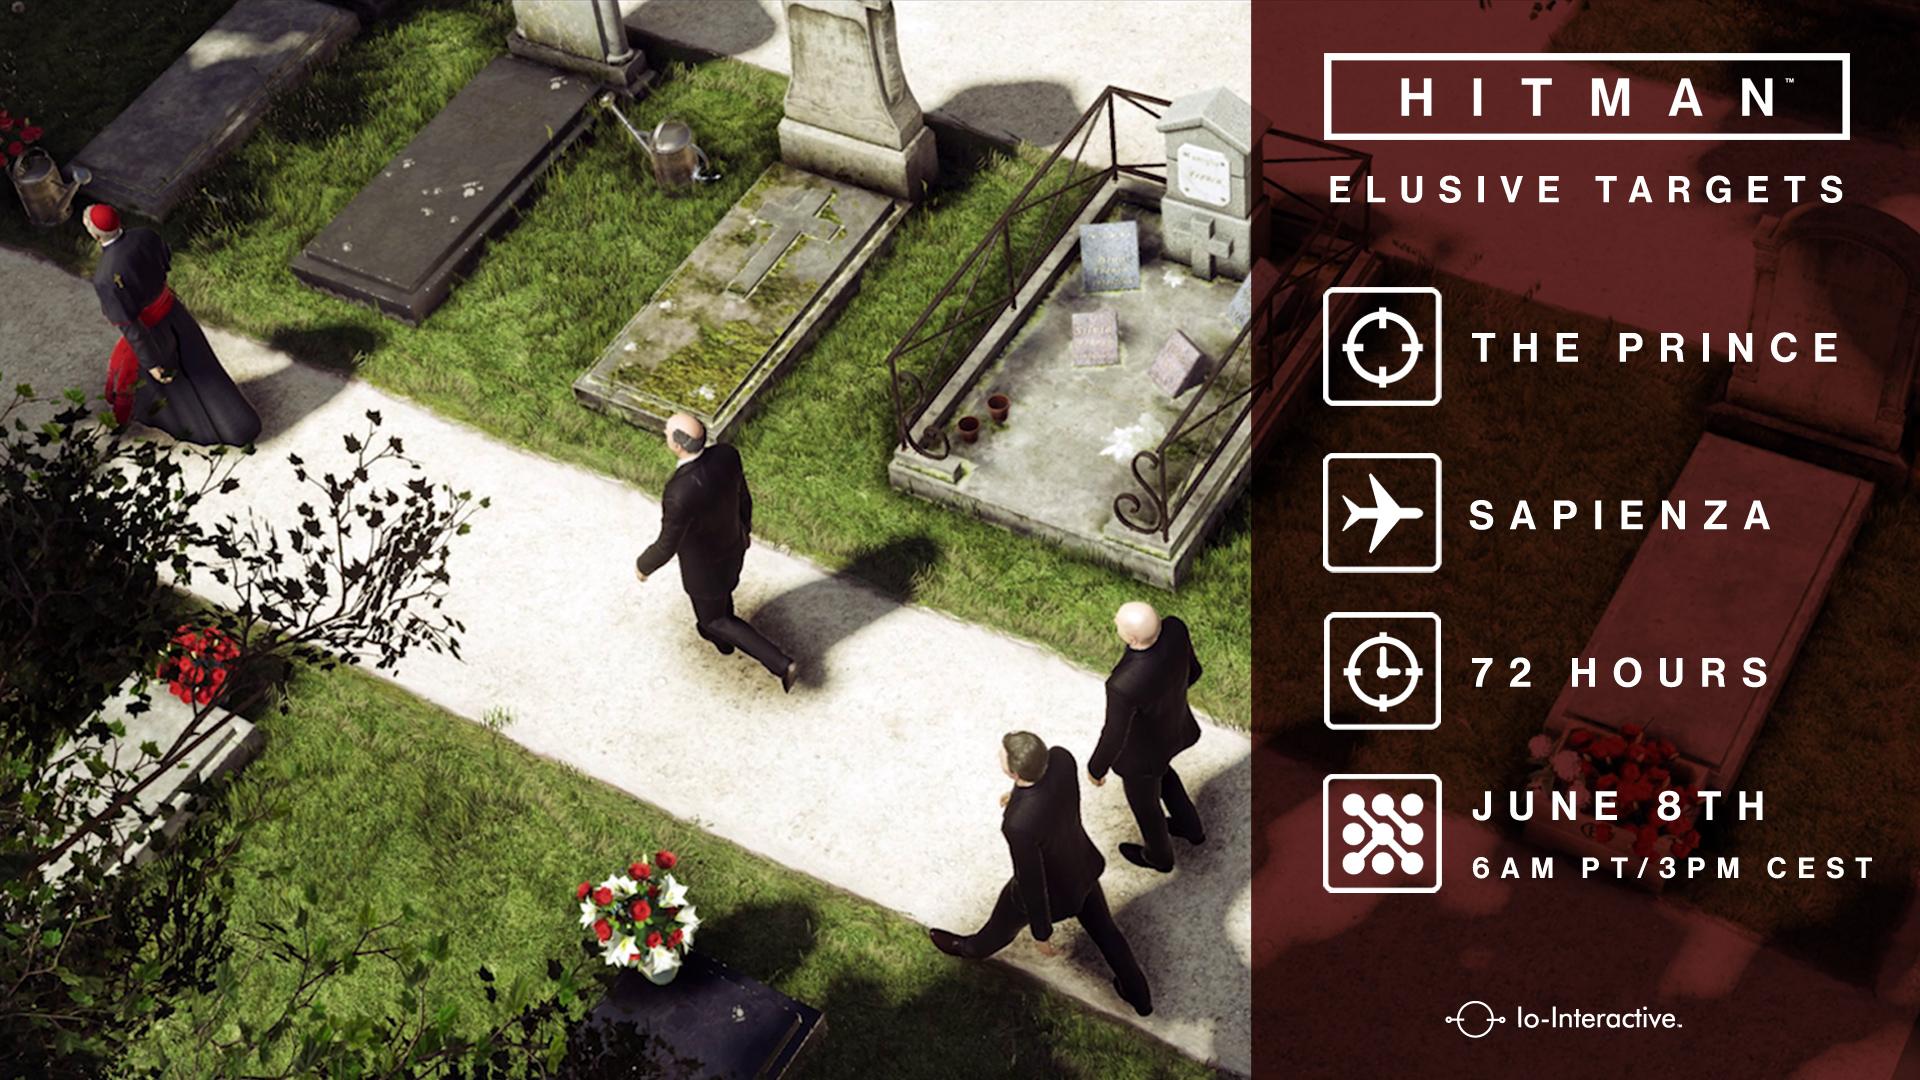 hitman-terzo-bersaglio-elusivo